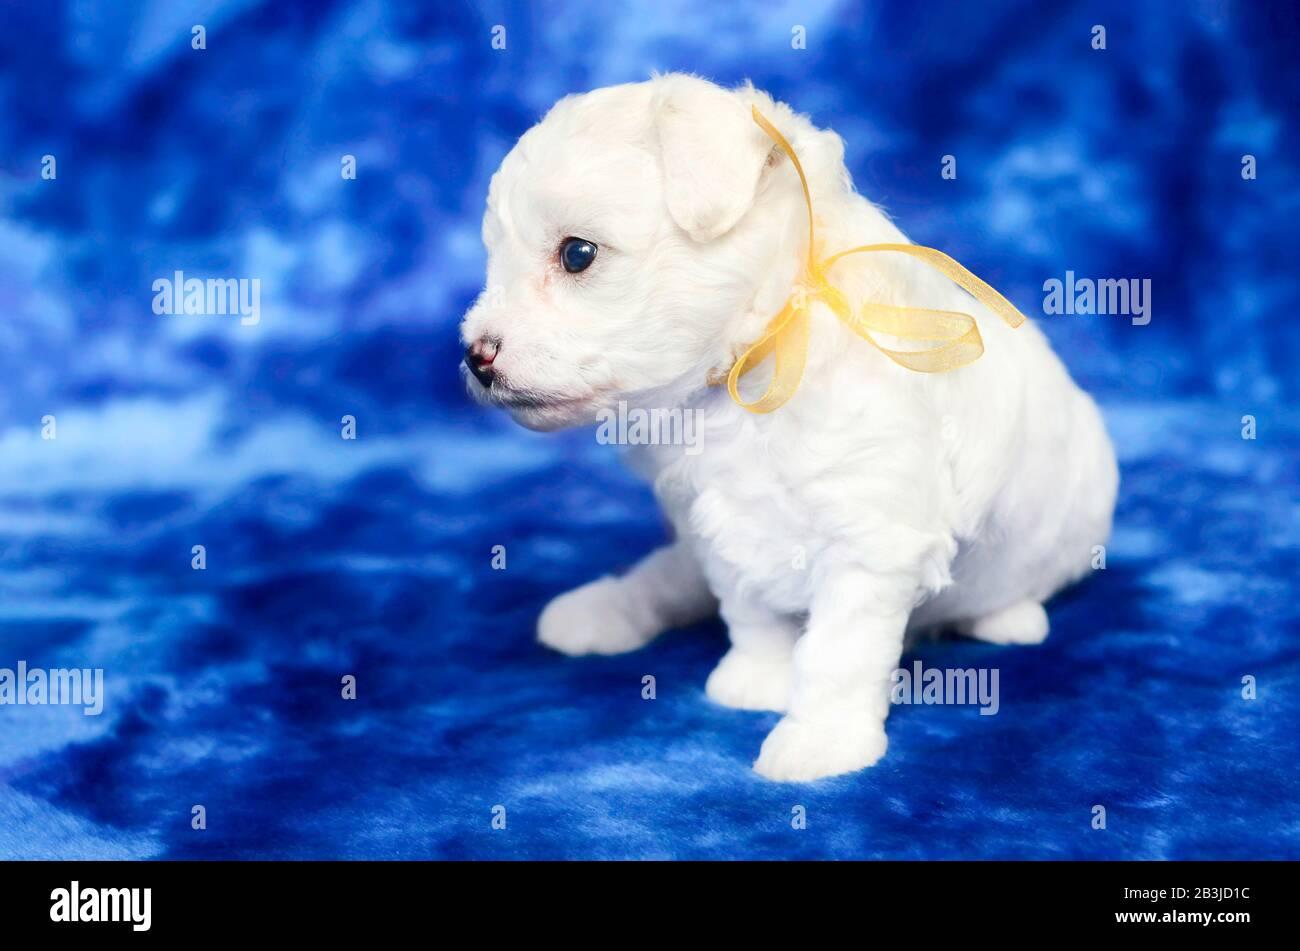 Cute Bichon Frise Puppy On A Blue Backgroud Studio Shot Stock Photo Alamy